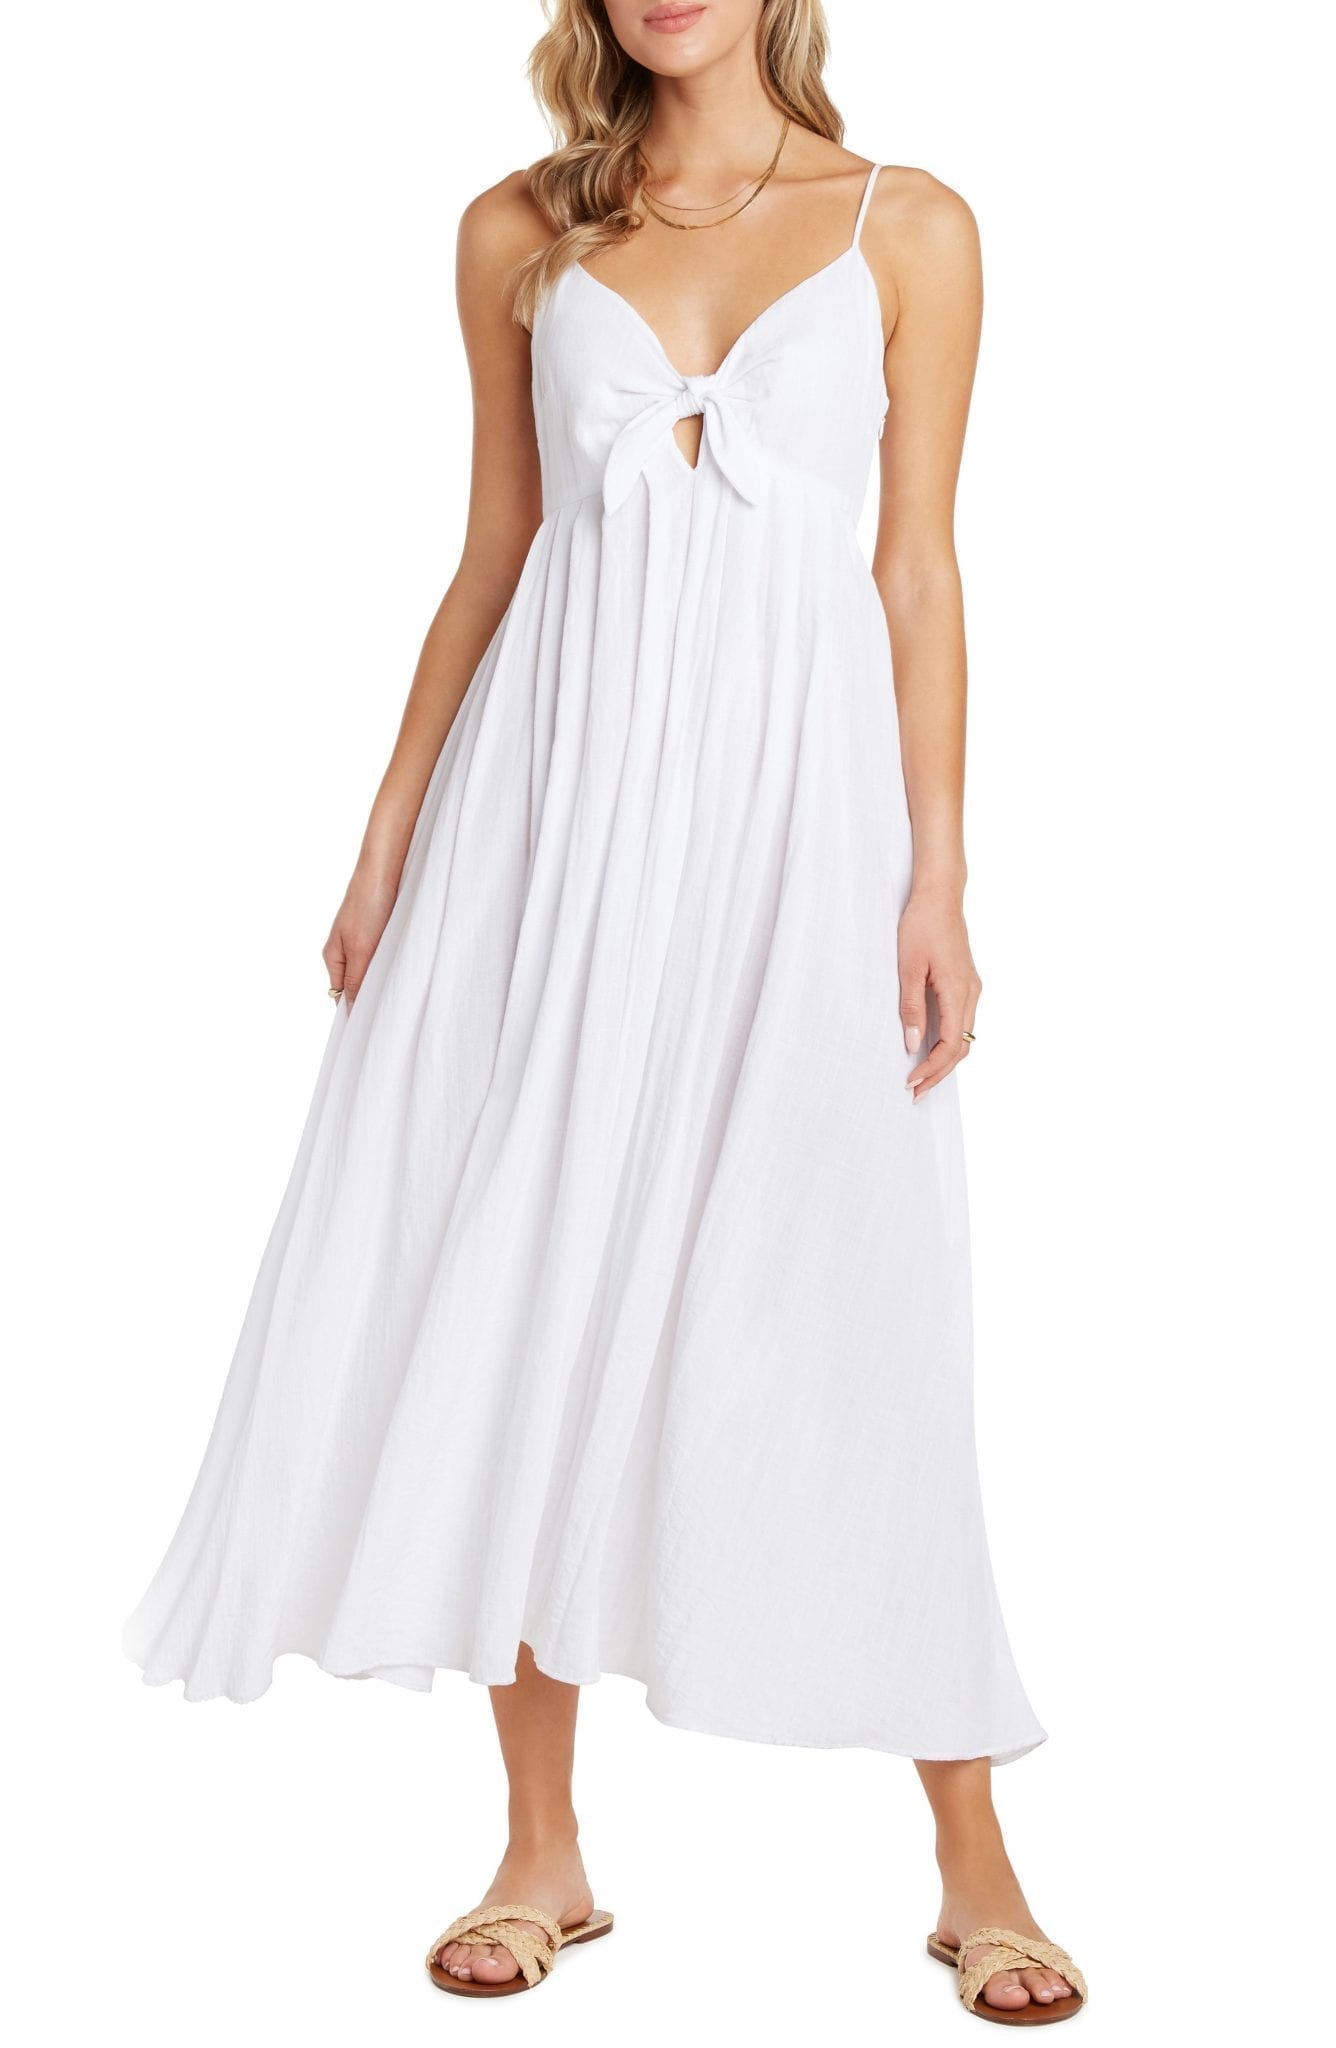 WILLOW Rochelle Tie Front Midi Sun Dress